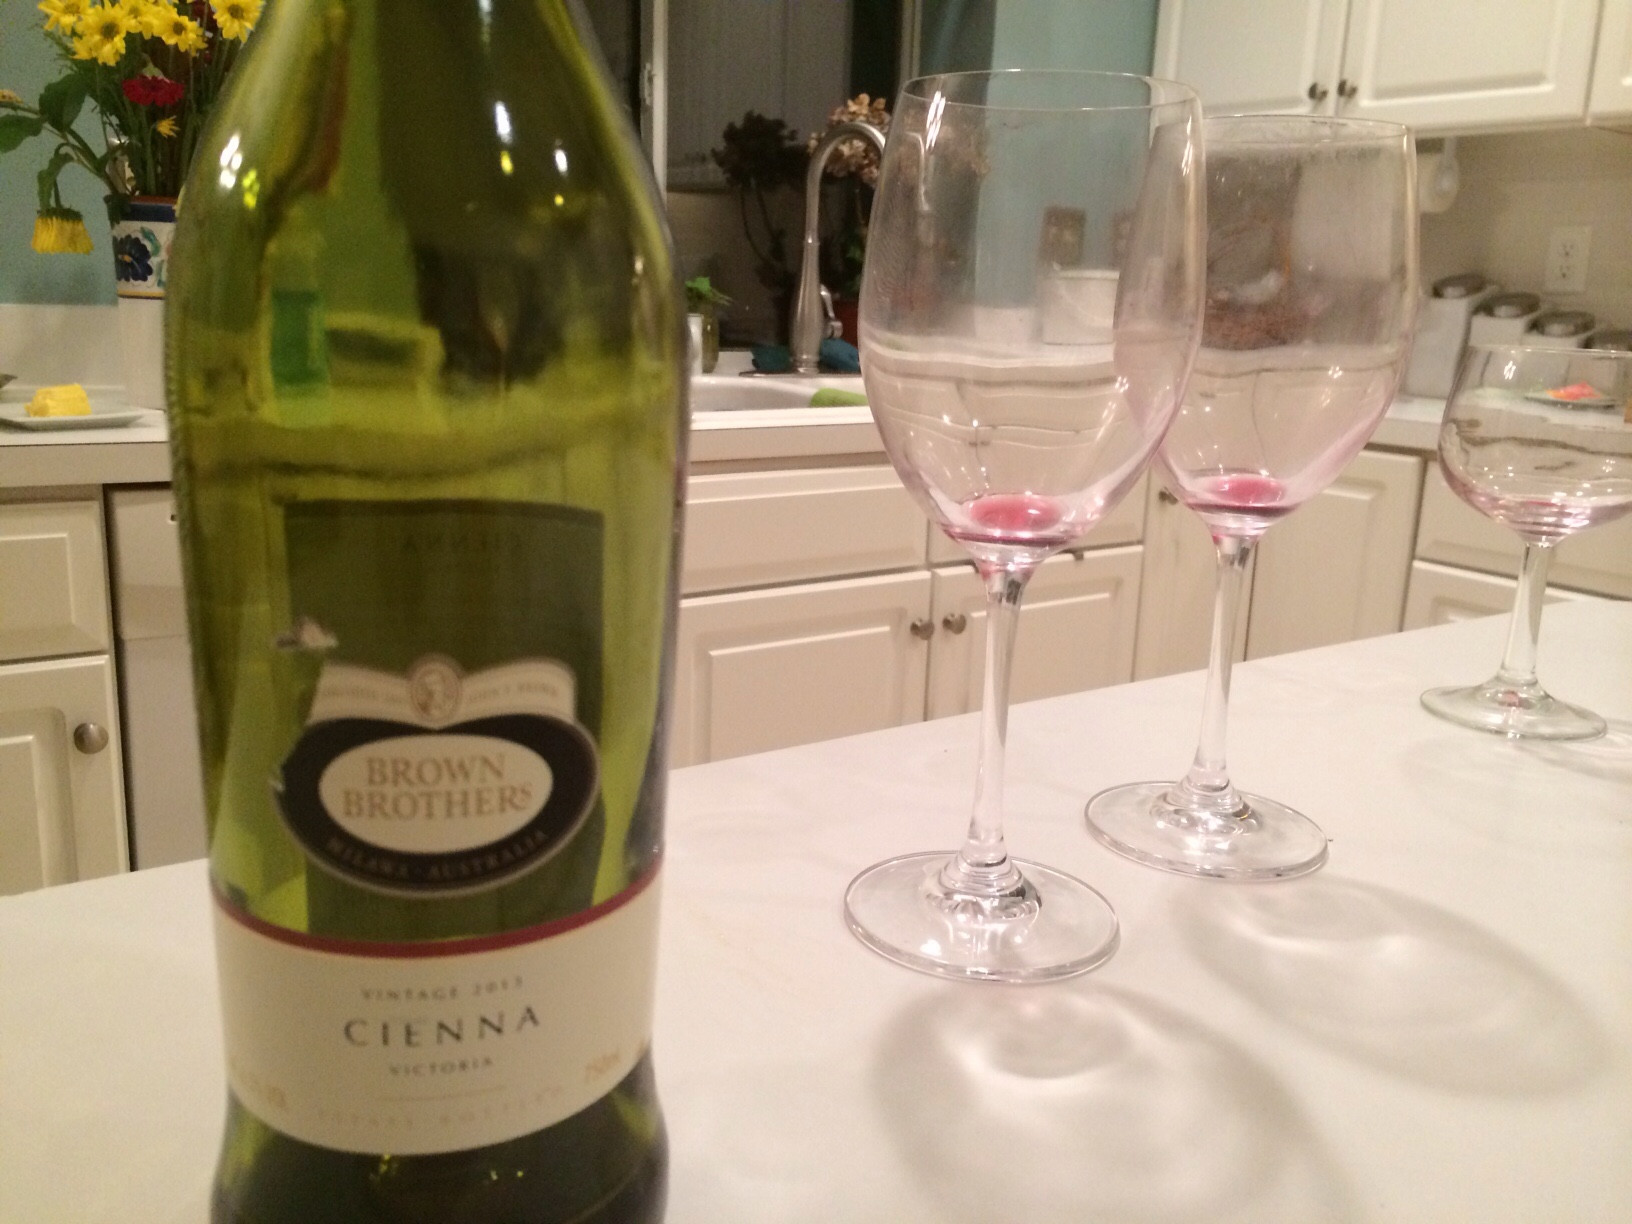 Cienna wine